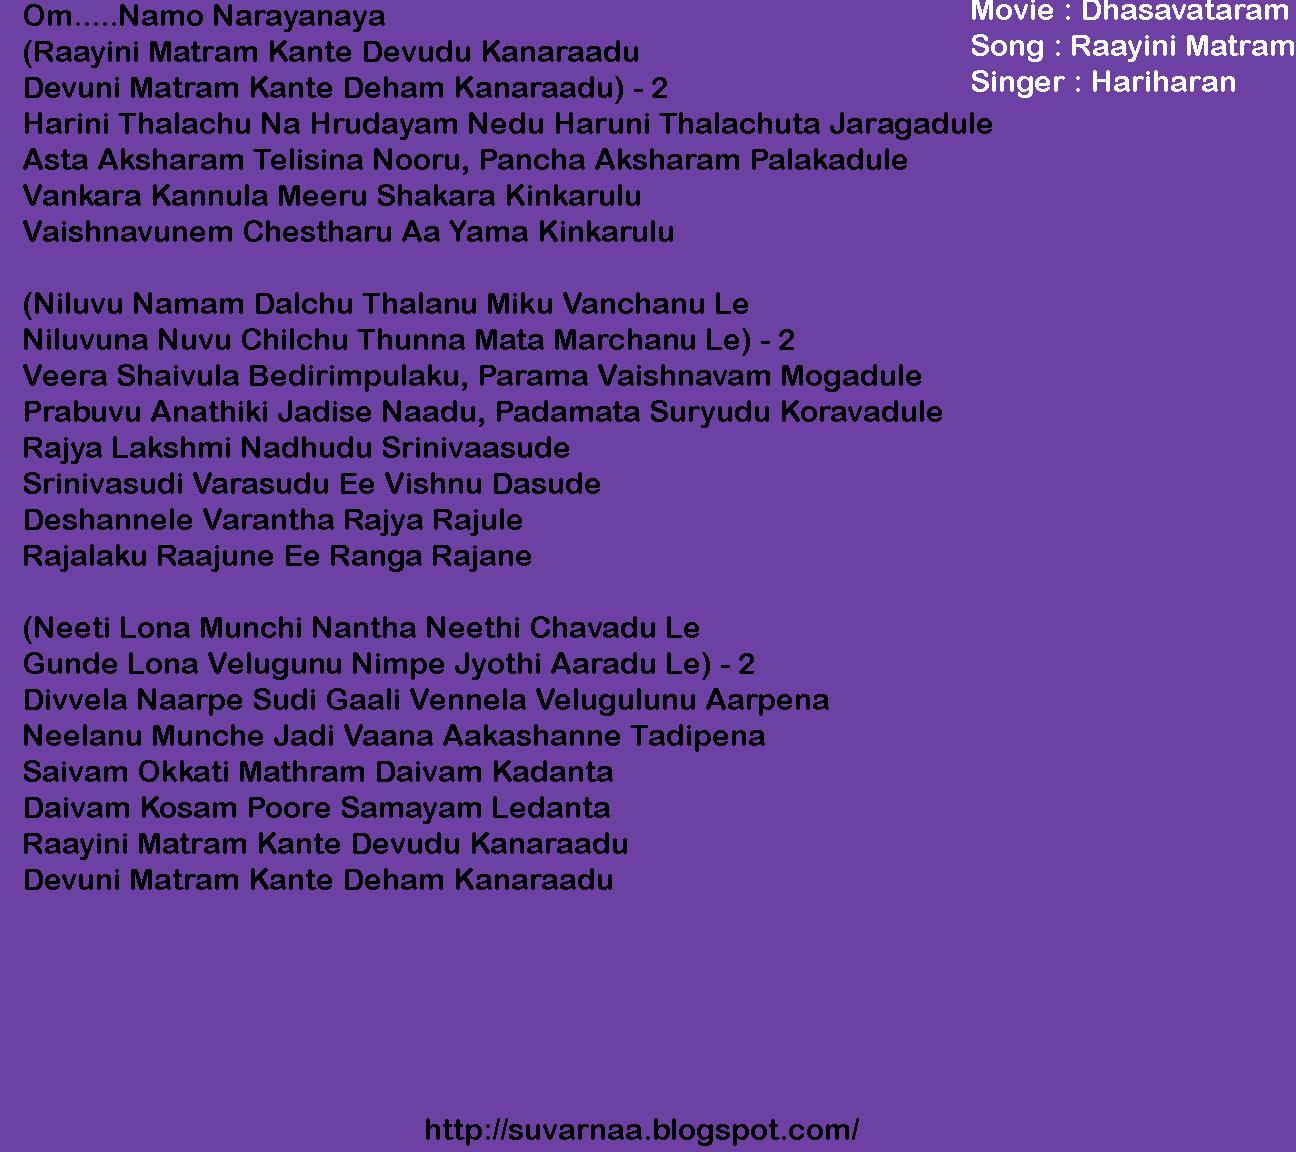 Telugu Hit Songs Lyrics Huge Collection